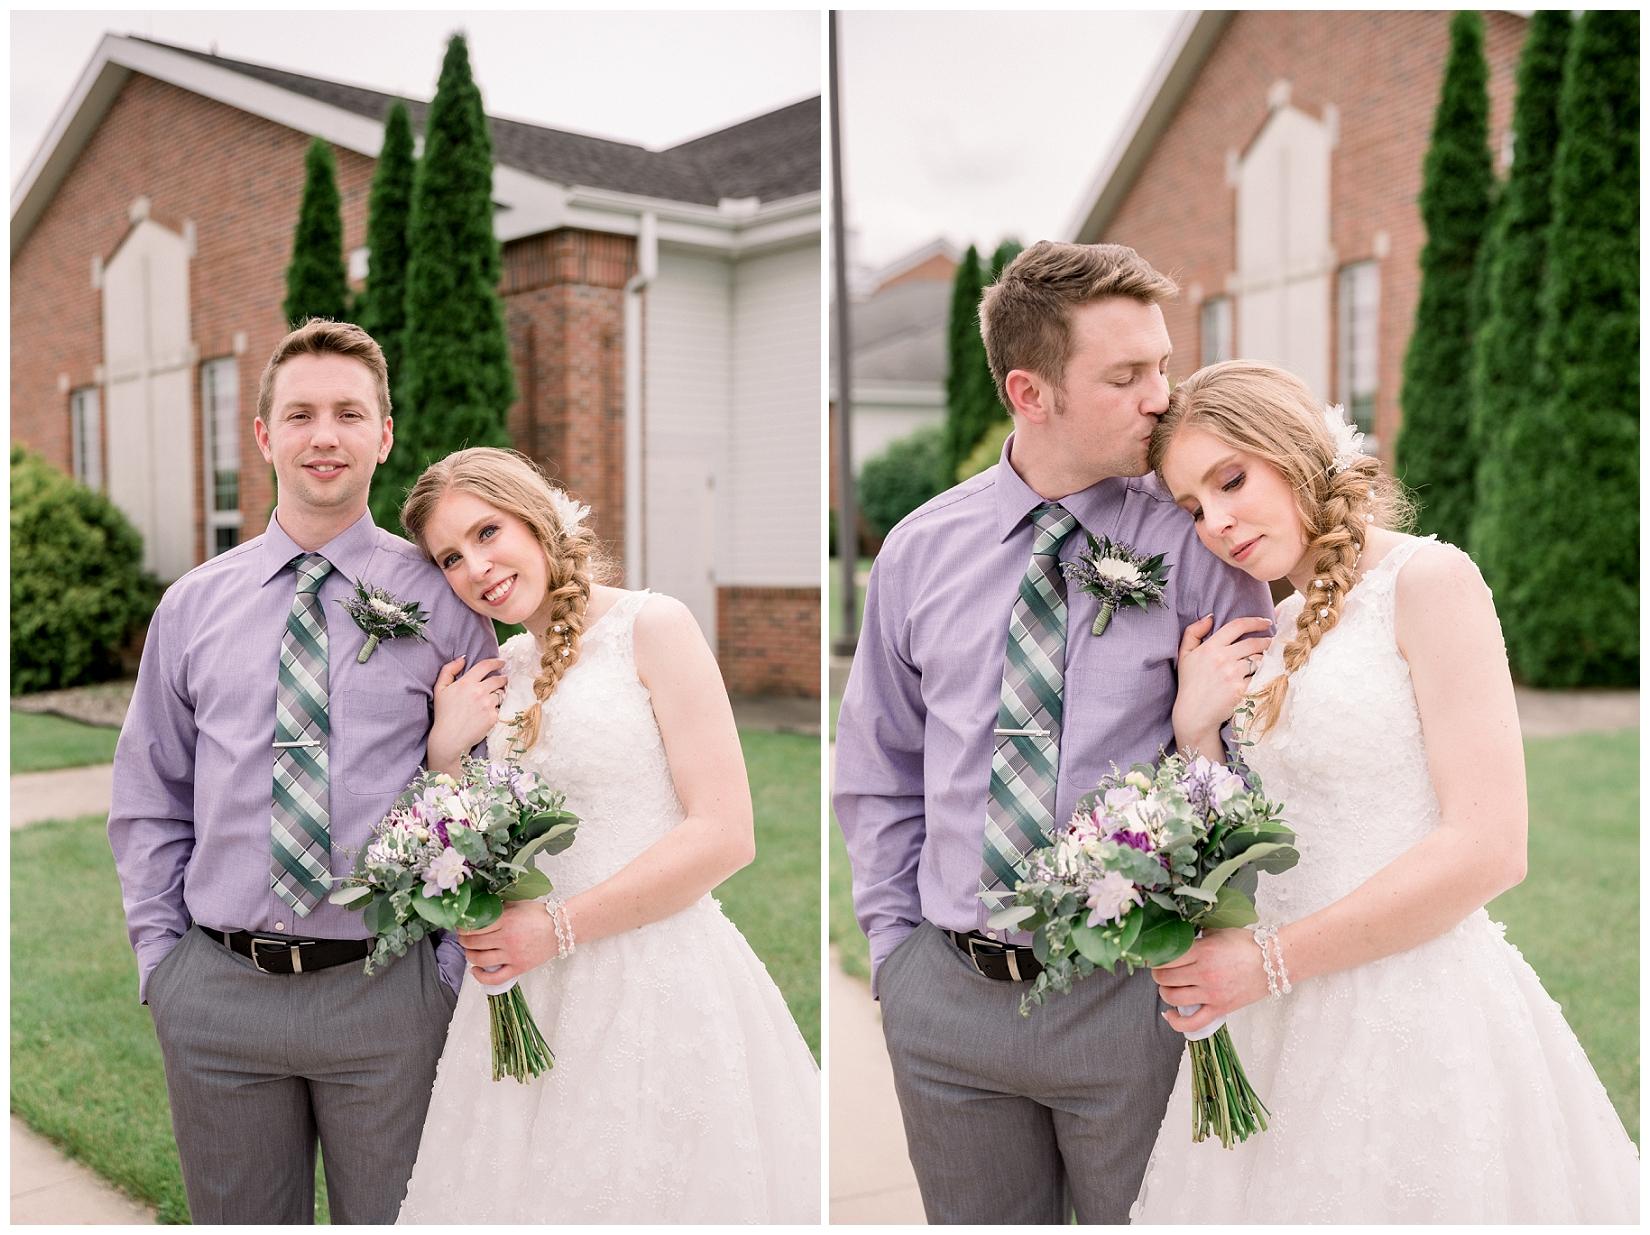 cat-alkire-wedding-photographer-indiana-chicago-indianapolis-fort-wayne_1308.jpg